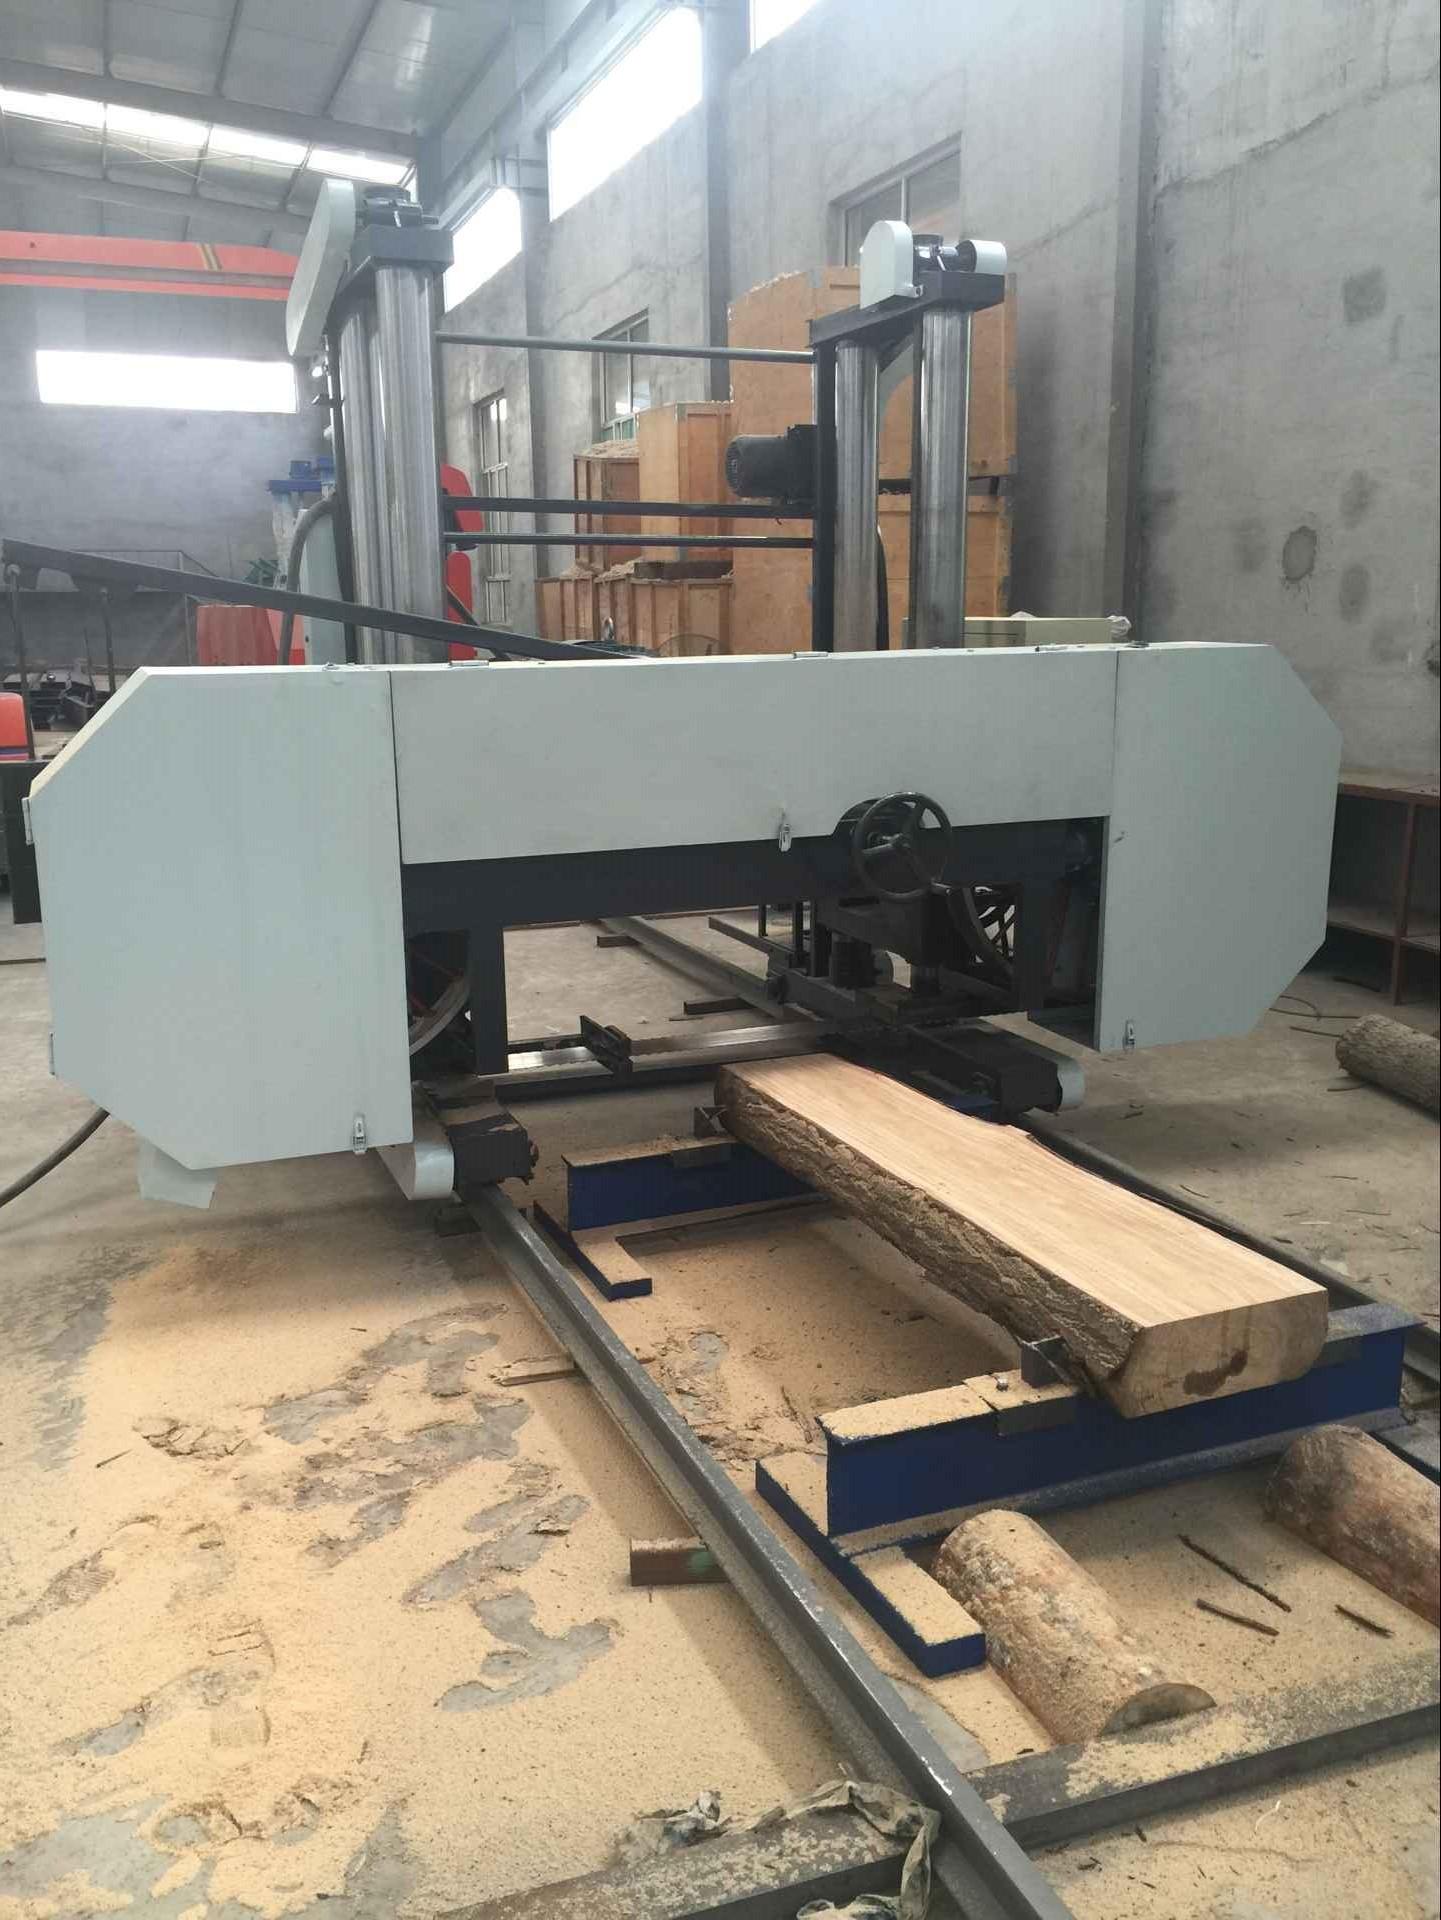 wood bandsaw heavy duty large size horizontal band sawing machine